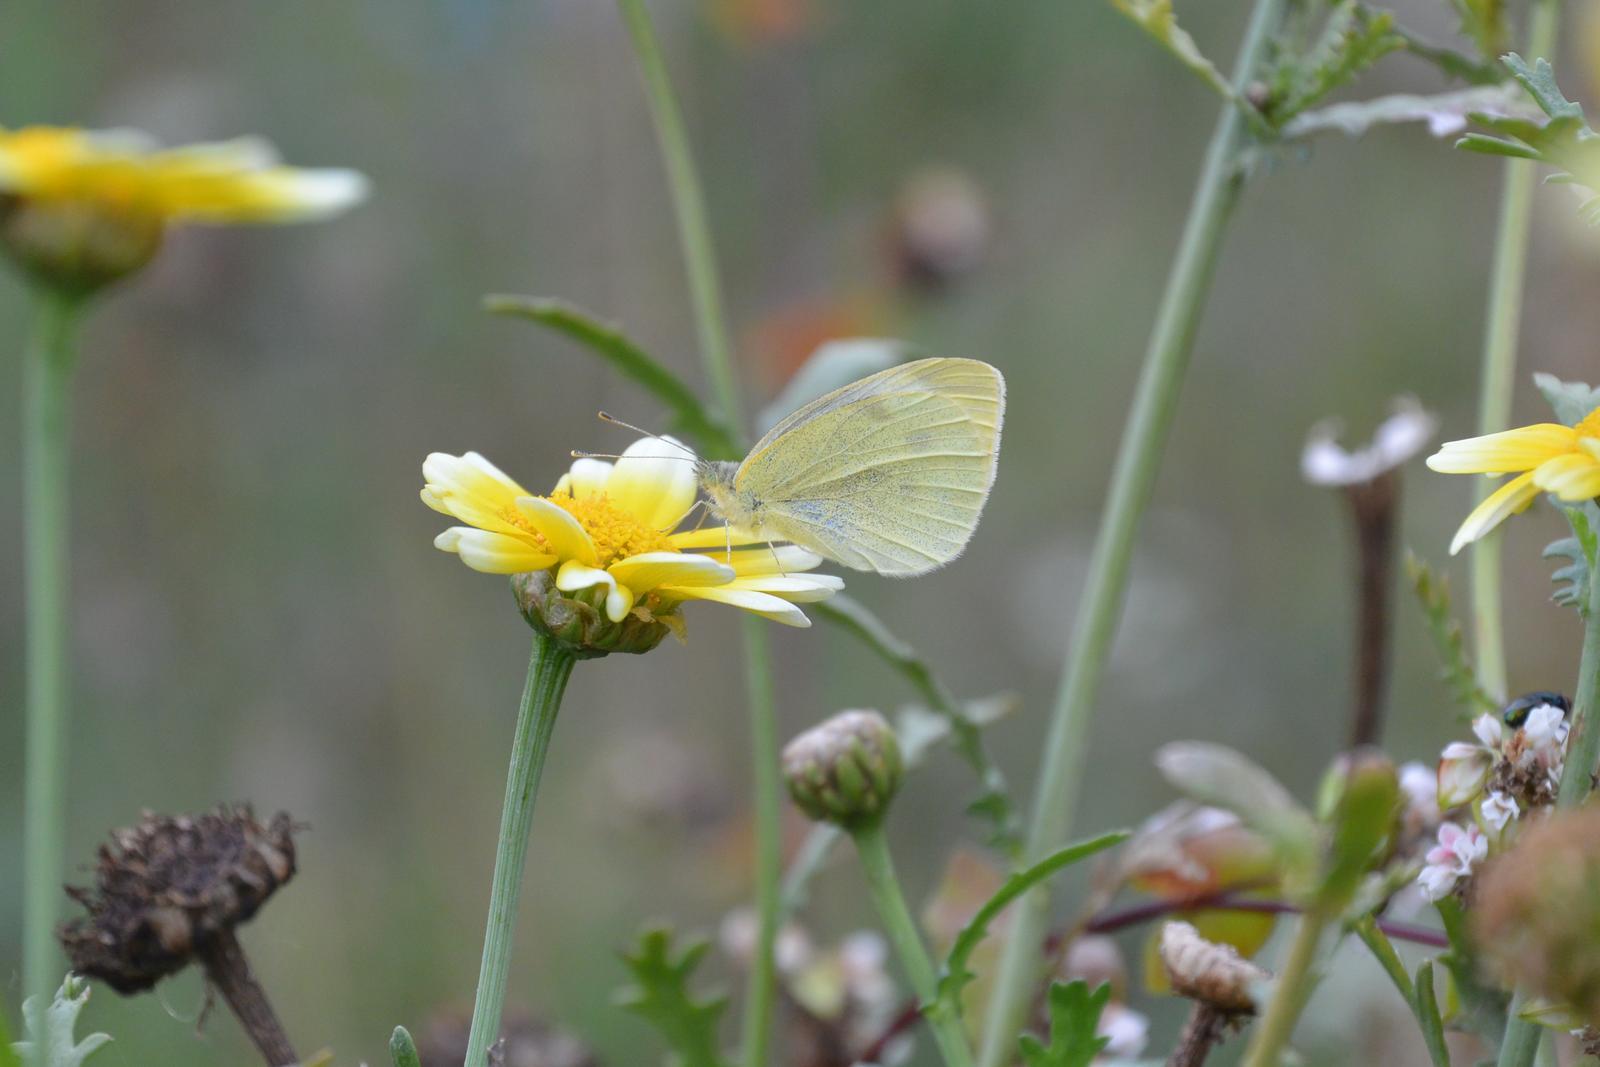 Motýlí zahrada 2019-2020 - Obrázek č. 106